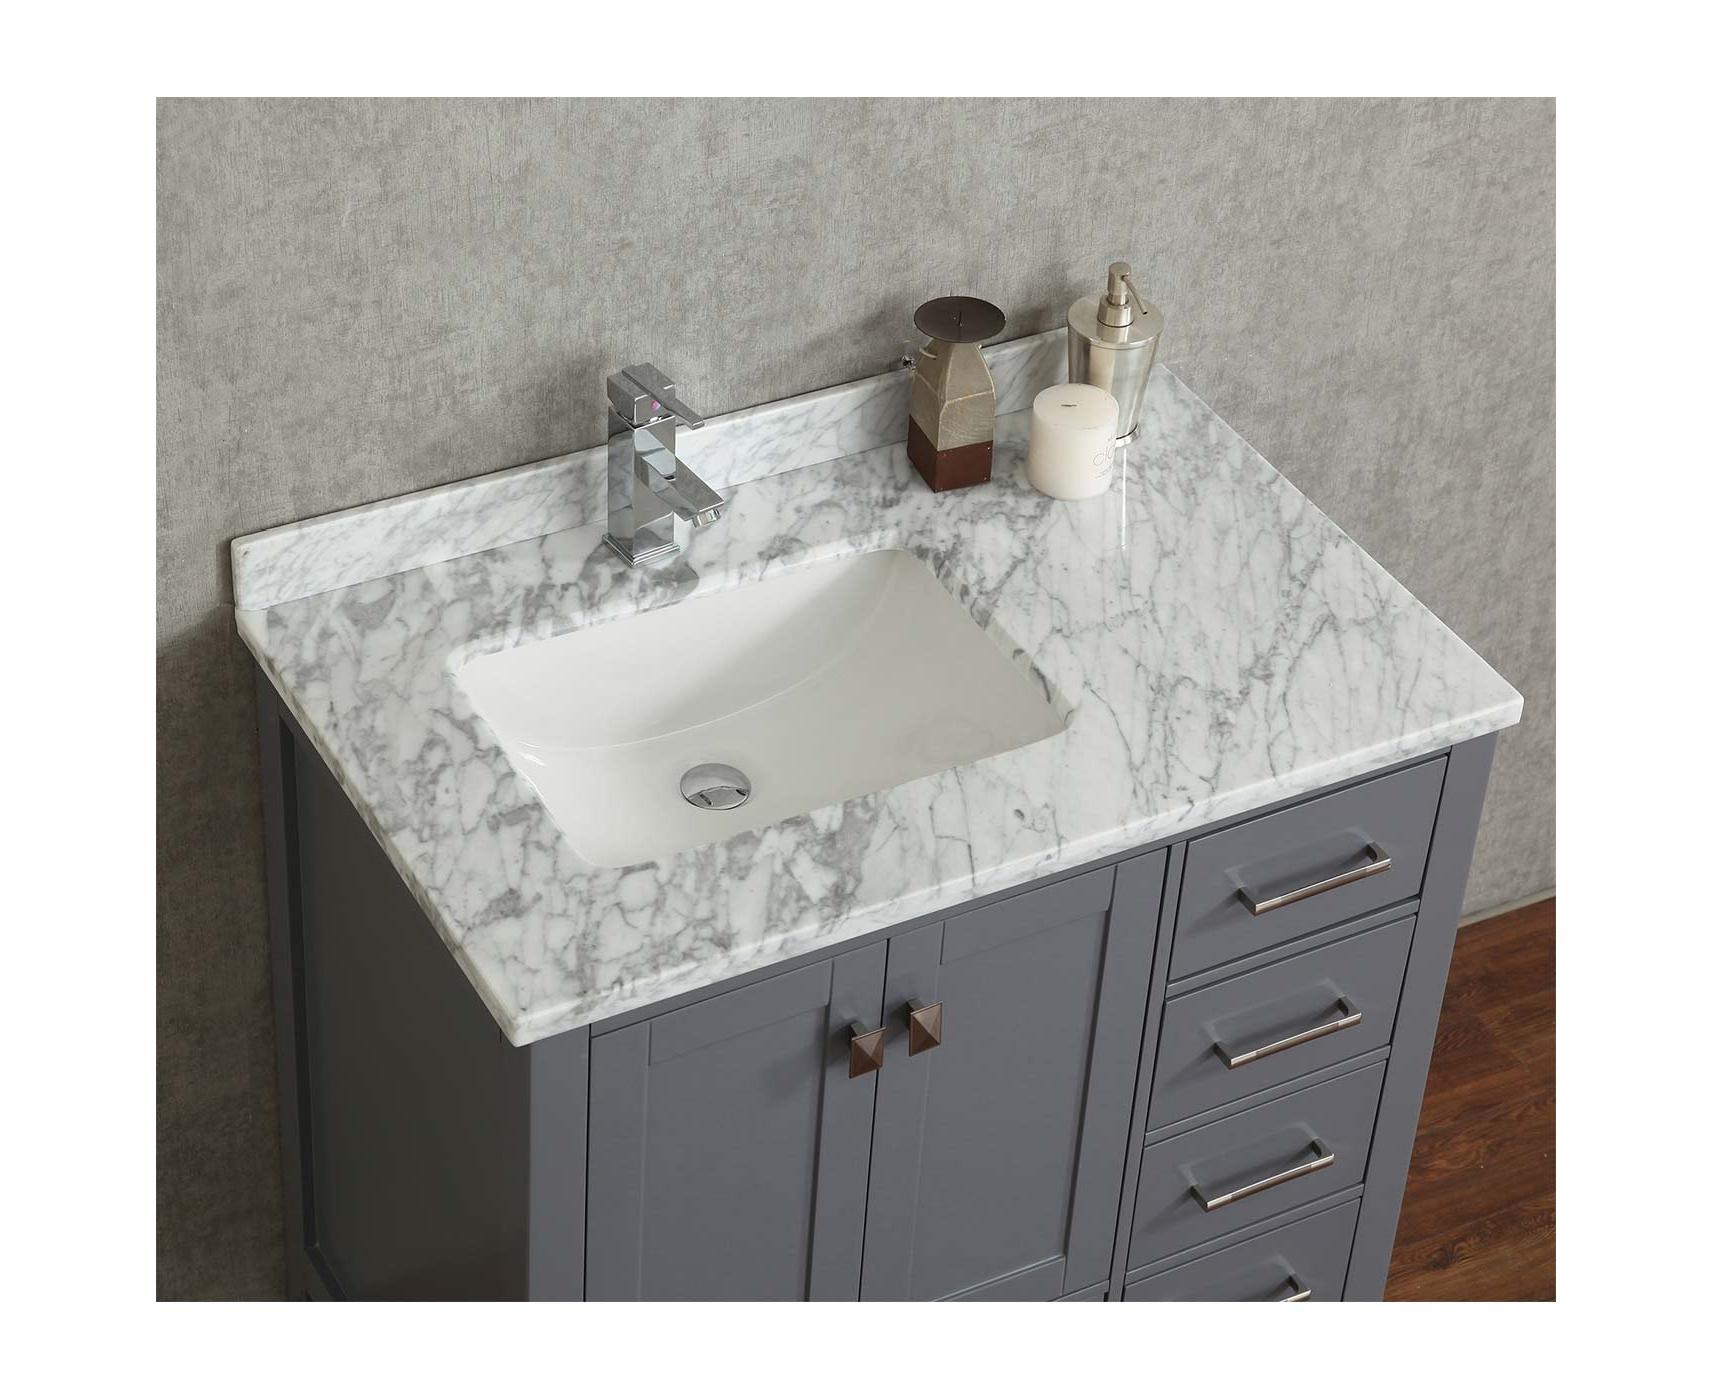 Buy Vincent 36 Inch Solid Wood Single Bathroom Vanity In Charcoal Grey Hm 13001 36 Wmsq Cg Conceptbaths Com